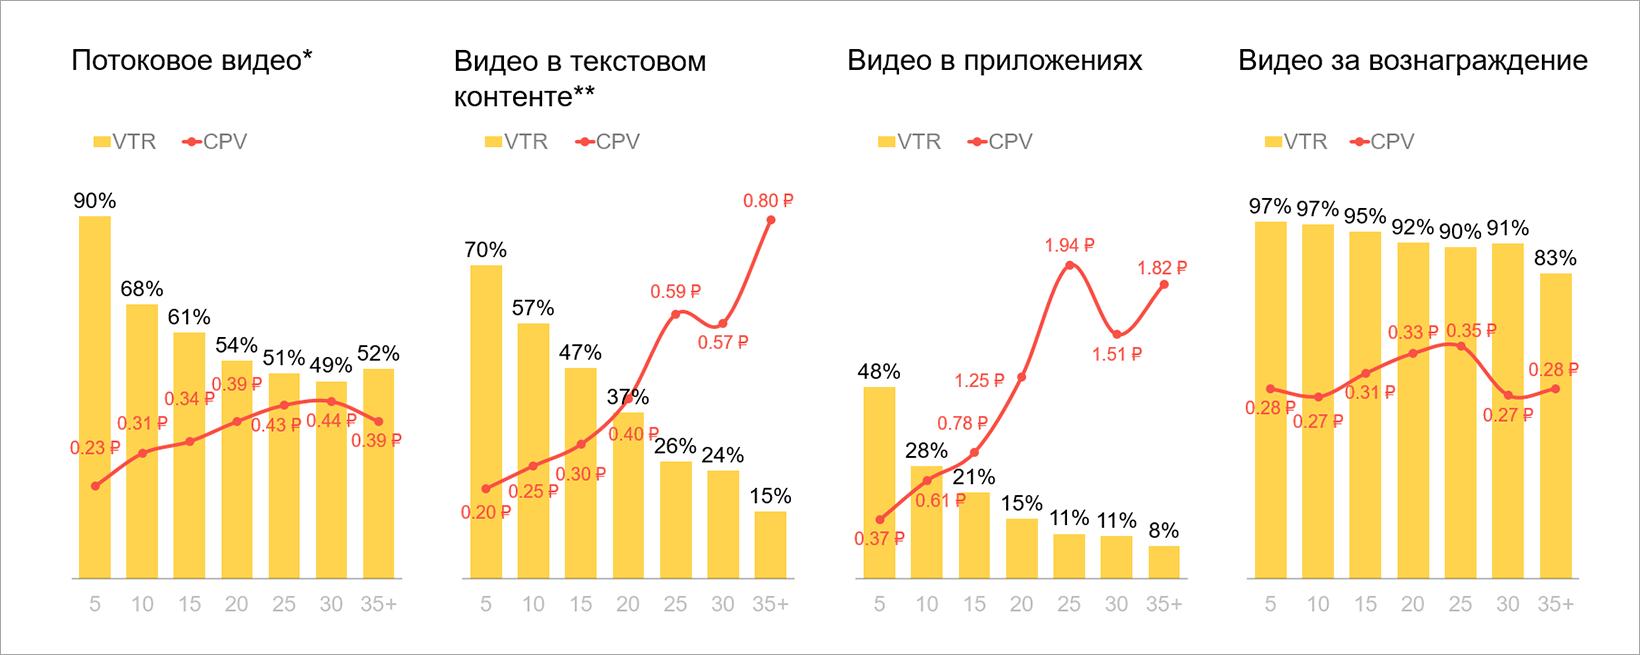 VTR и CPV по форматам и длине роликов